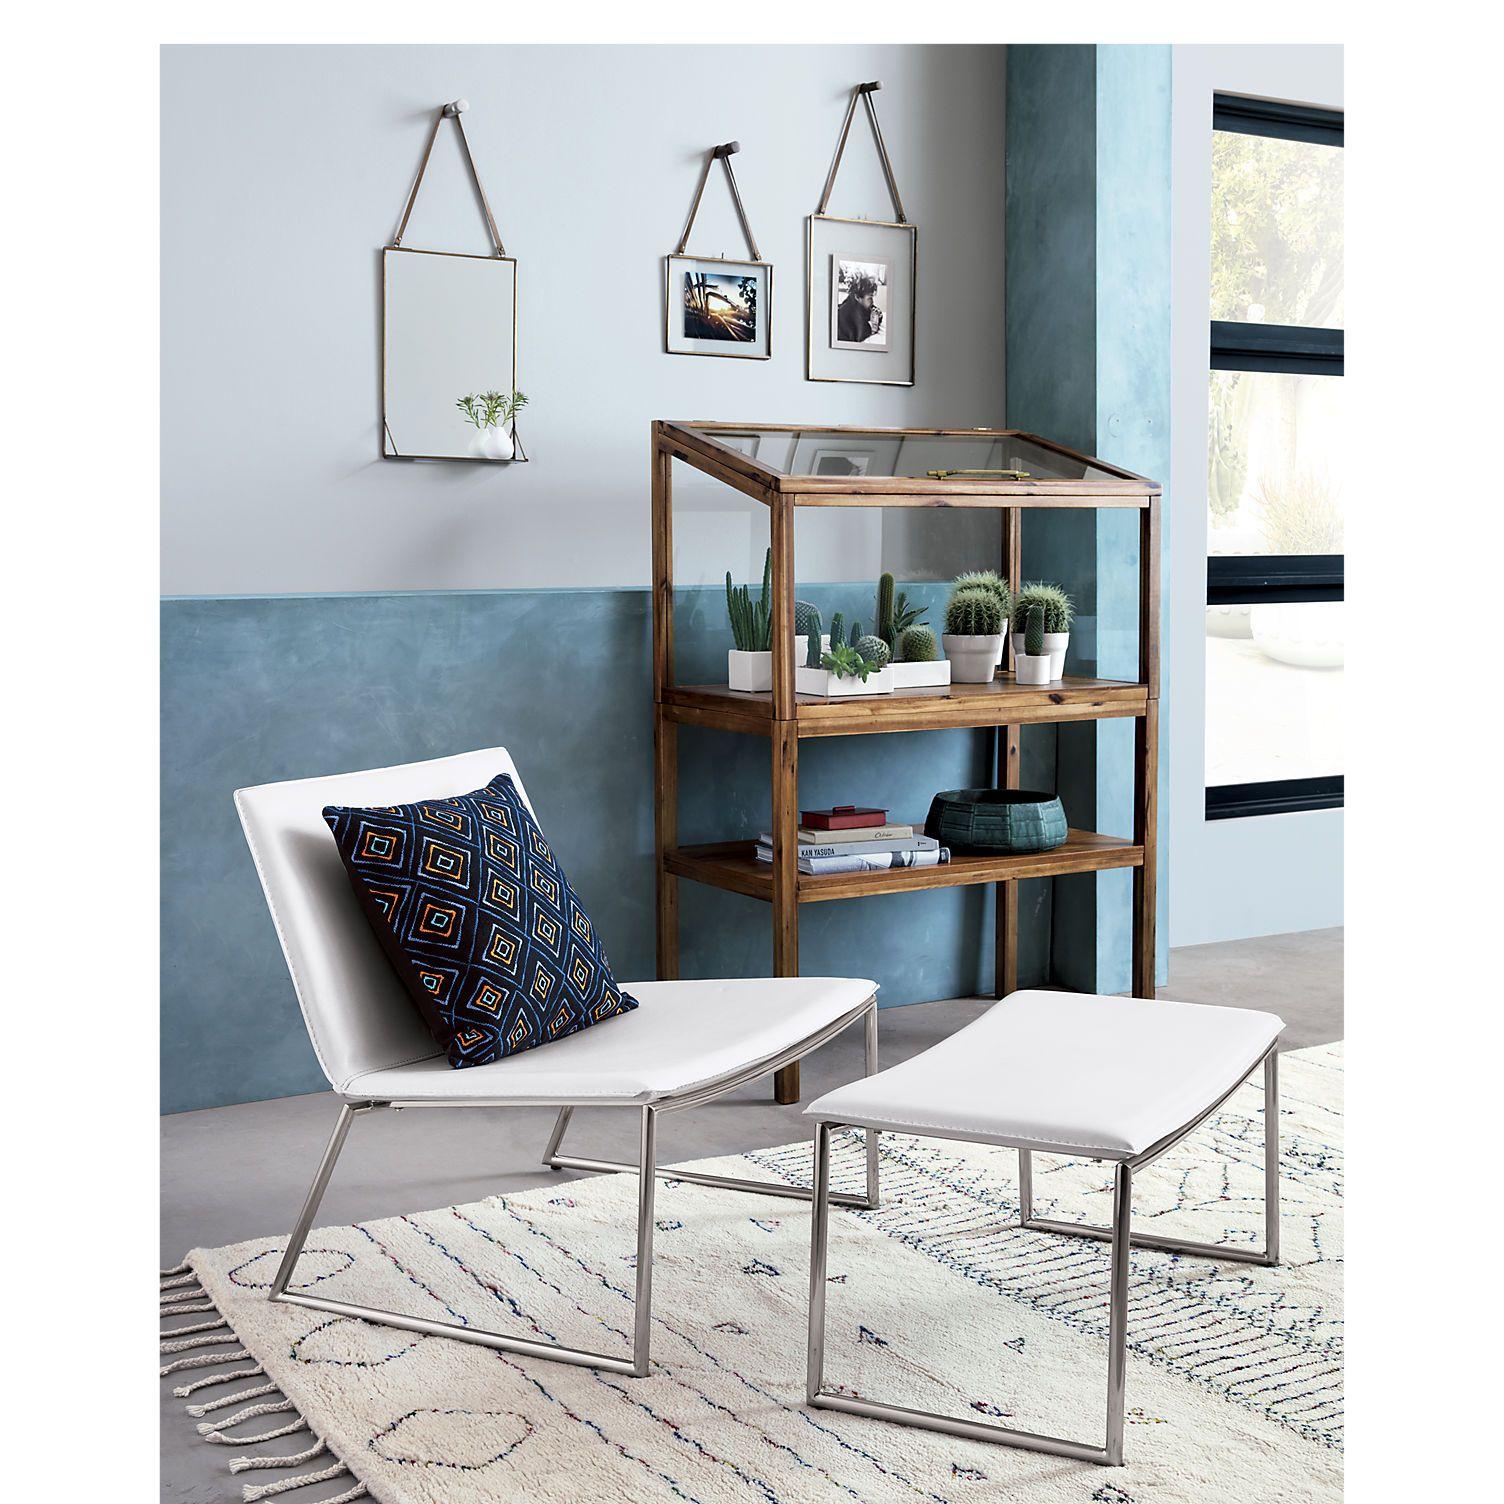 Triumph Chalk Lounge Chair Tubular Steel Nickel Finish And  # Muebles Tubulares Beta